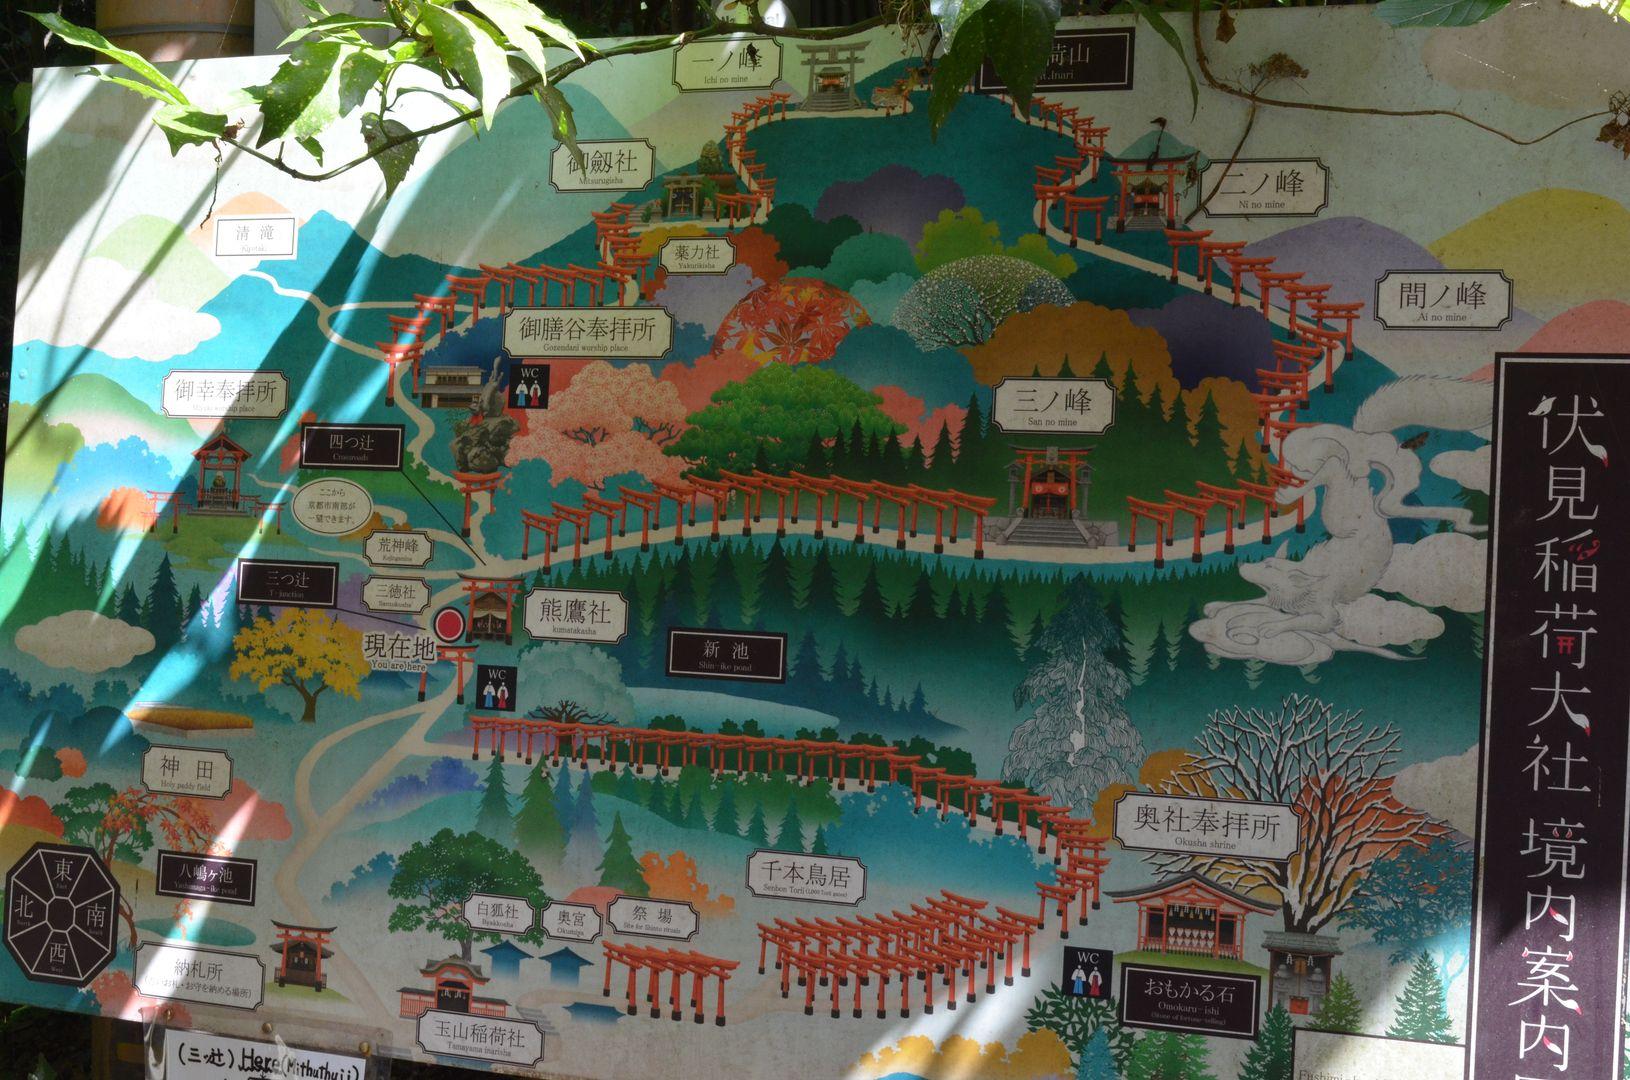 map of Fushimi Inari Taisha, Kyoto